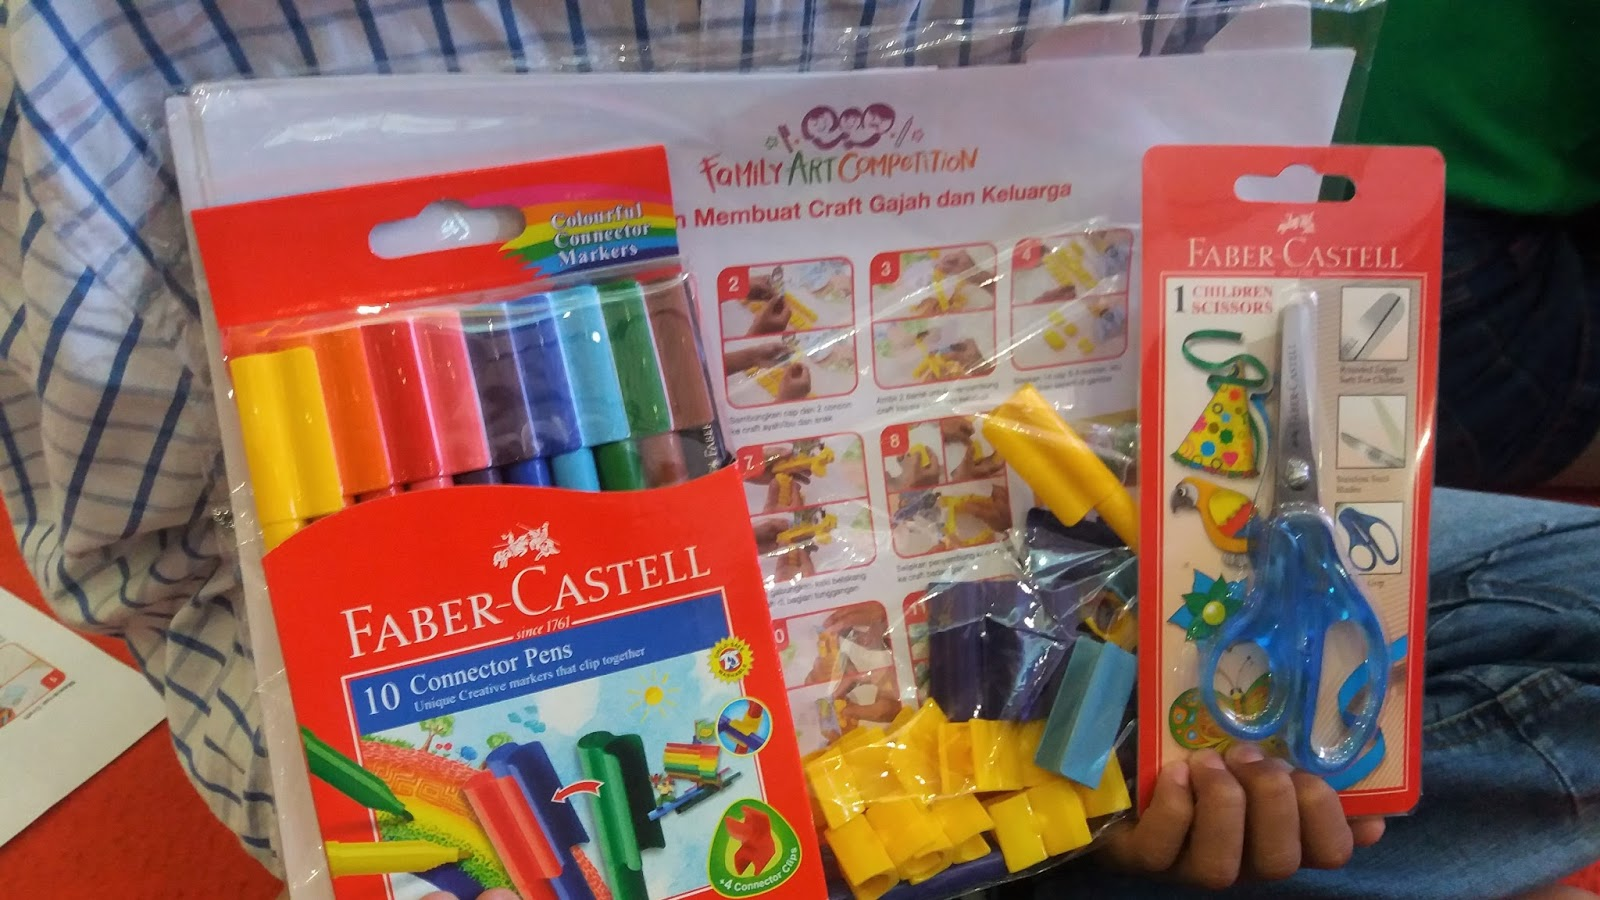 Family Art Competition Bersama Faber Castell Bukan Lomba Mewarnai